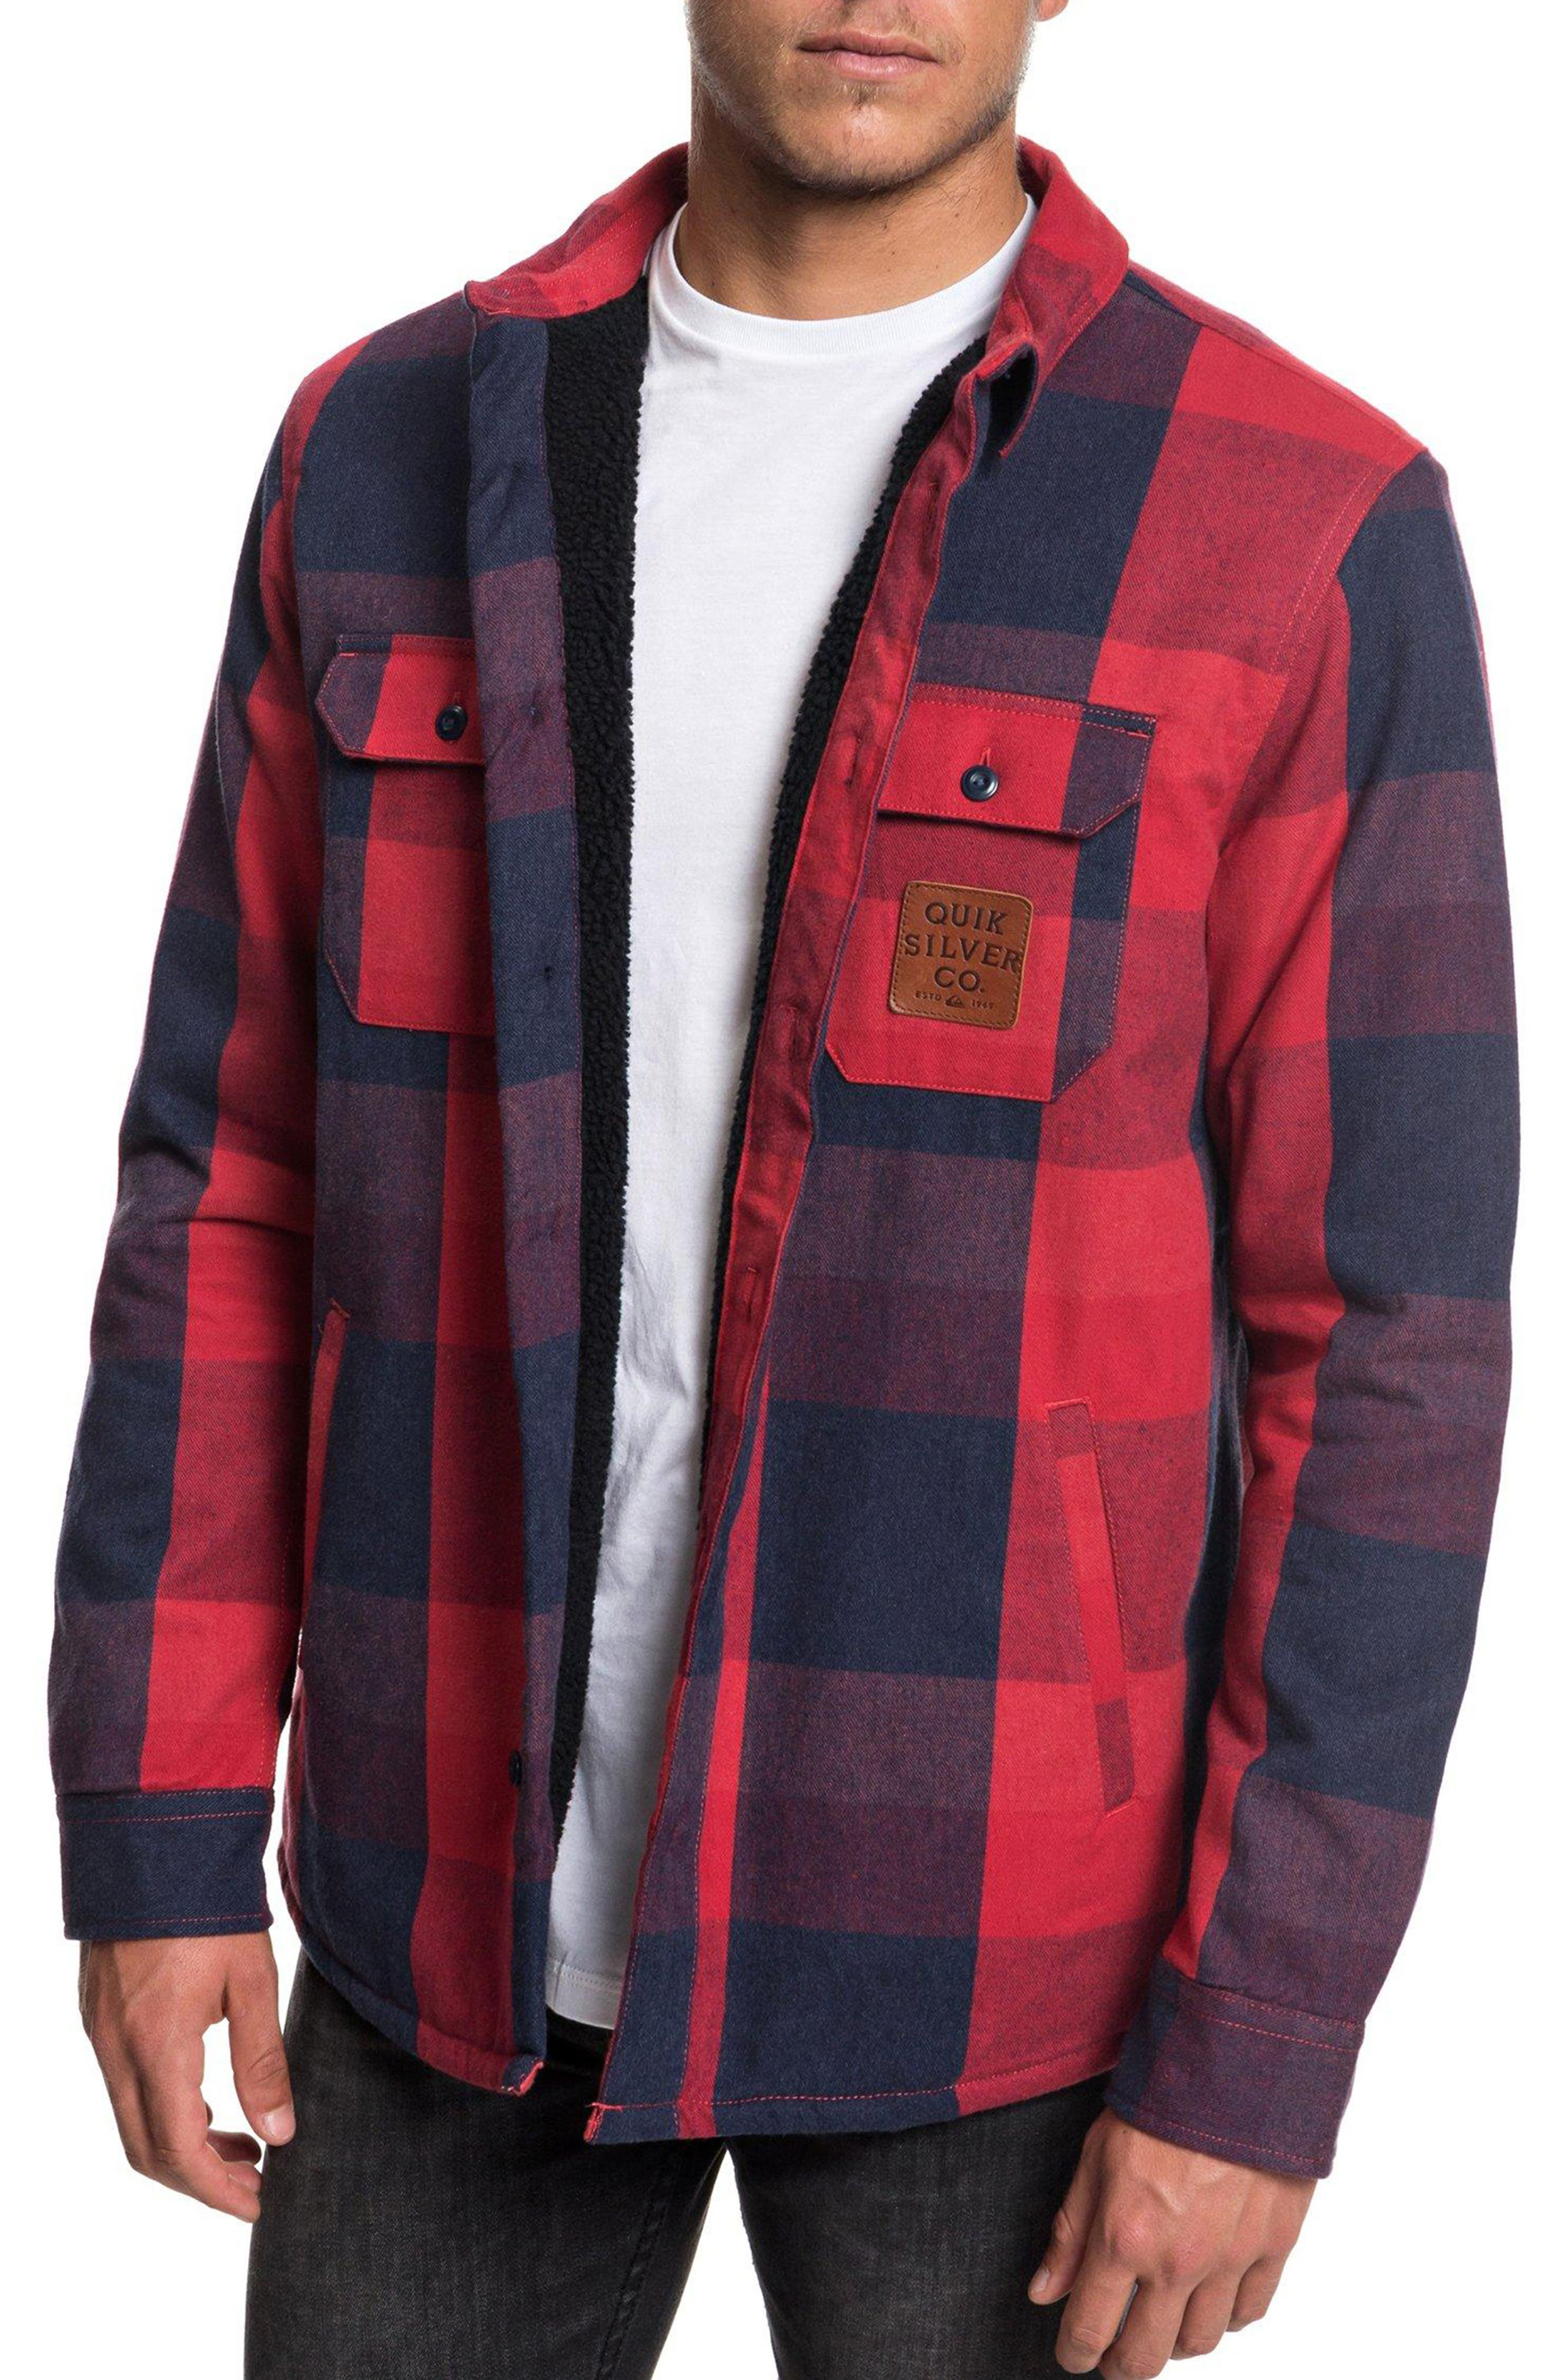 QUIKSILVER Miho Stones Long Sleeve Woven Shirt Jacket in Garnet Sherpa